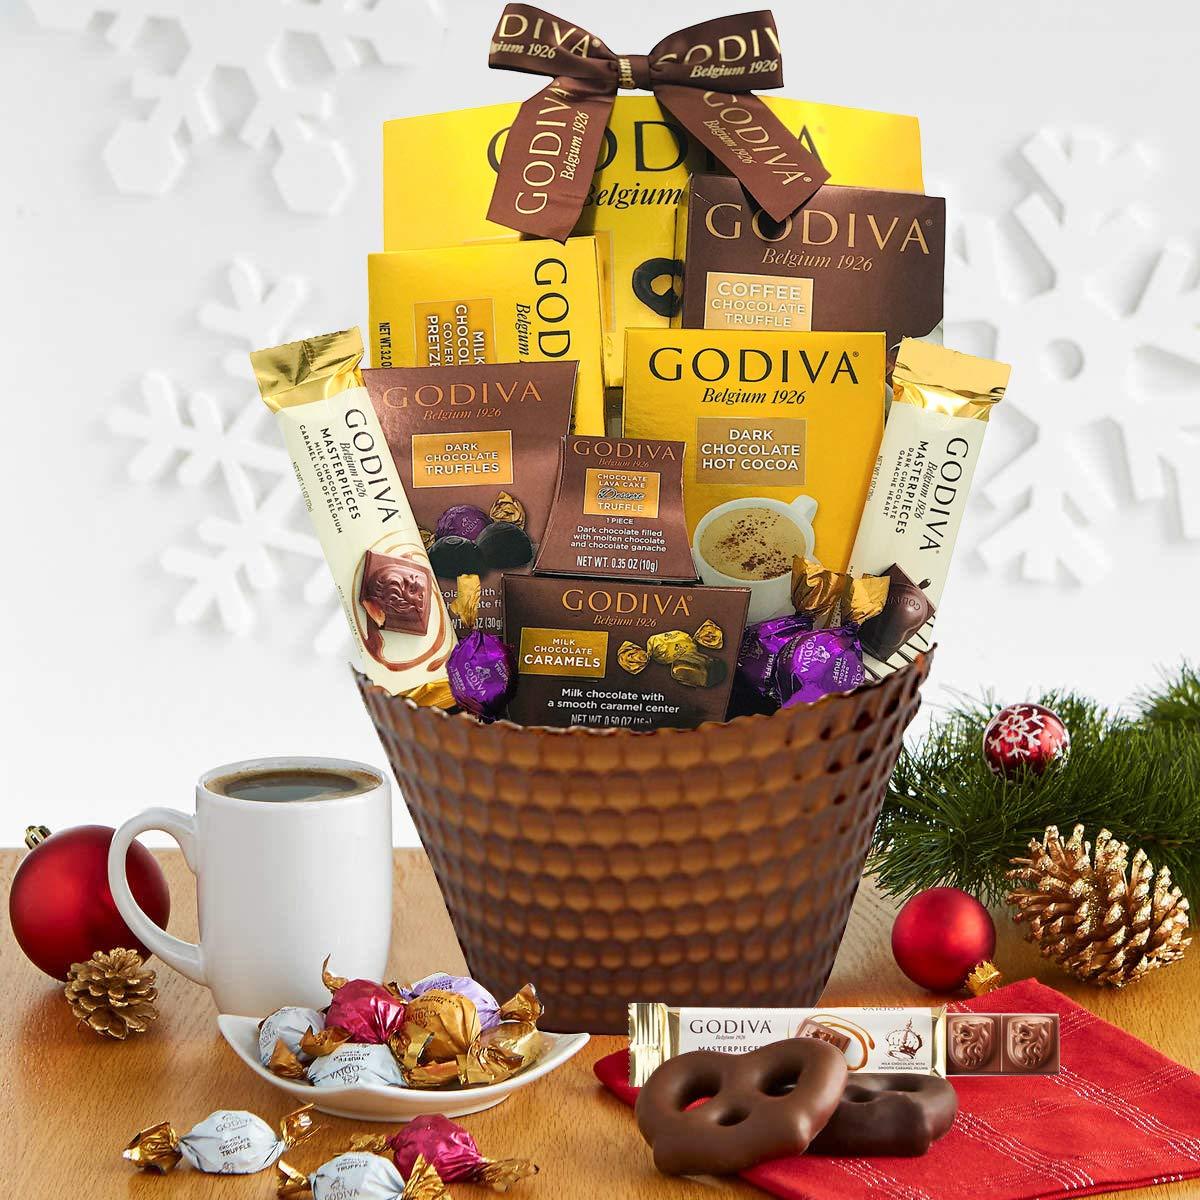 LA Signature Chocolatier Gift Basket –Chocolate Assortment For 2020 Christmas Holiday Season-Gift Box-Keepsake Glass-Gift Basket-Corporate Gift Box,Birthday, Sympathy, Get Well - LA Signature